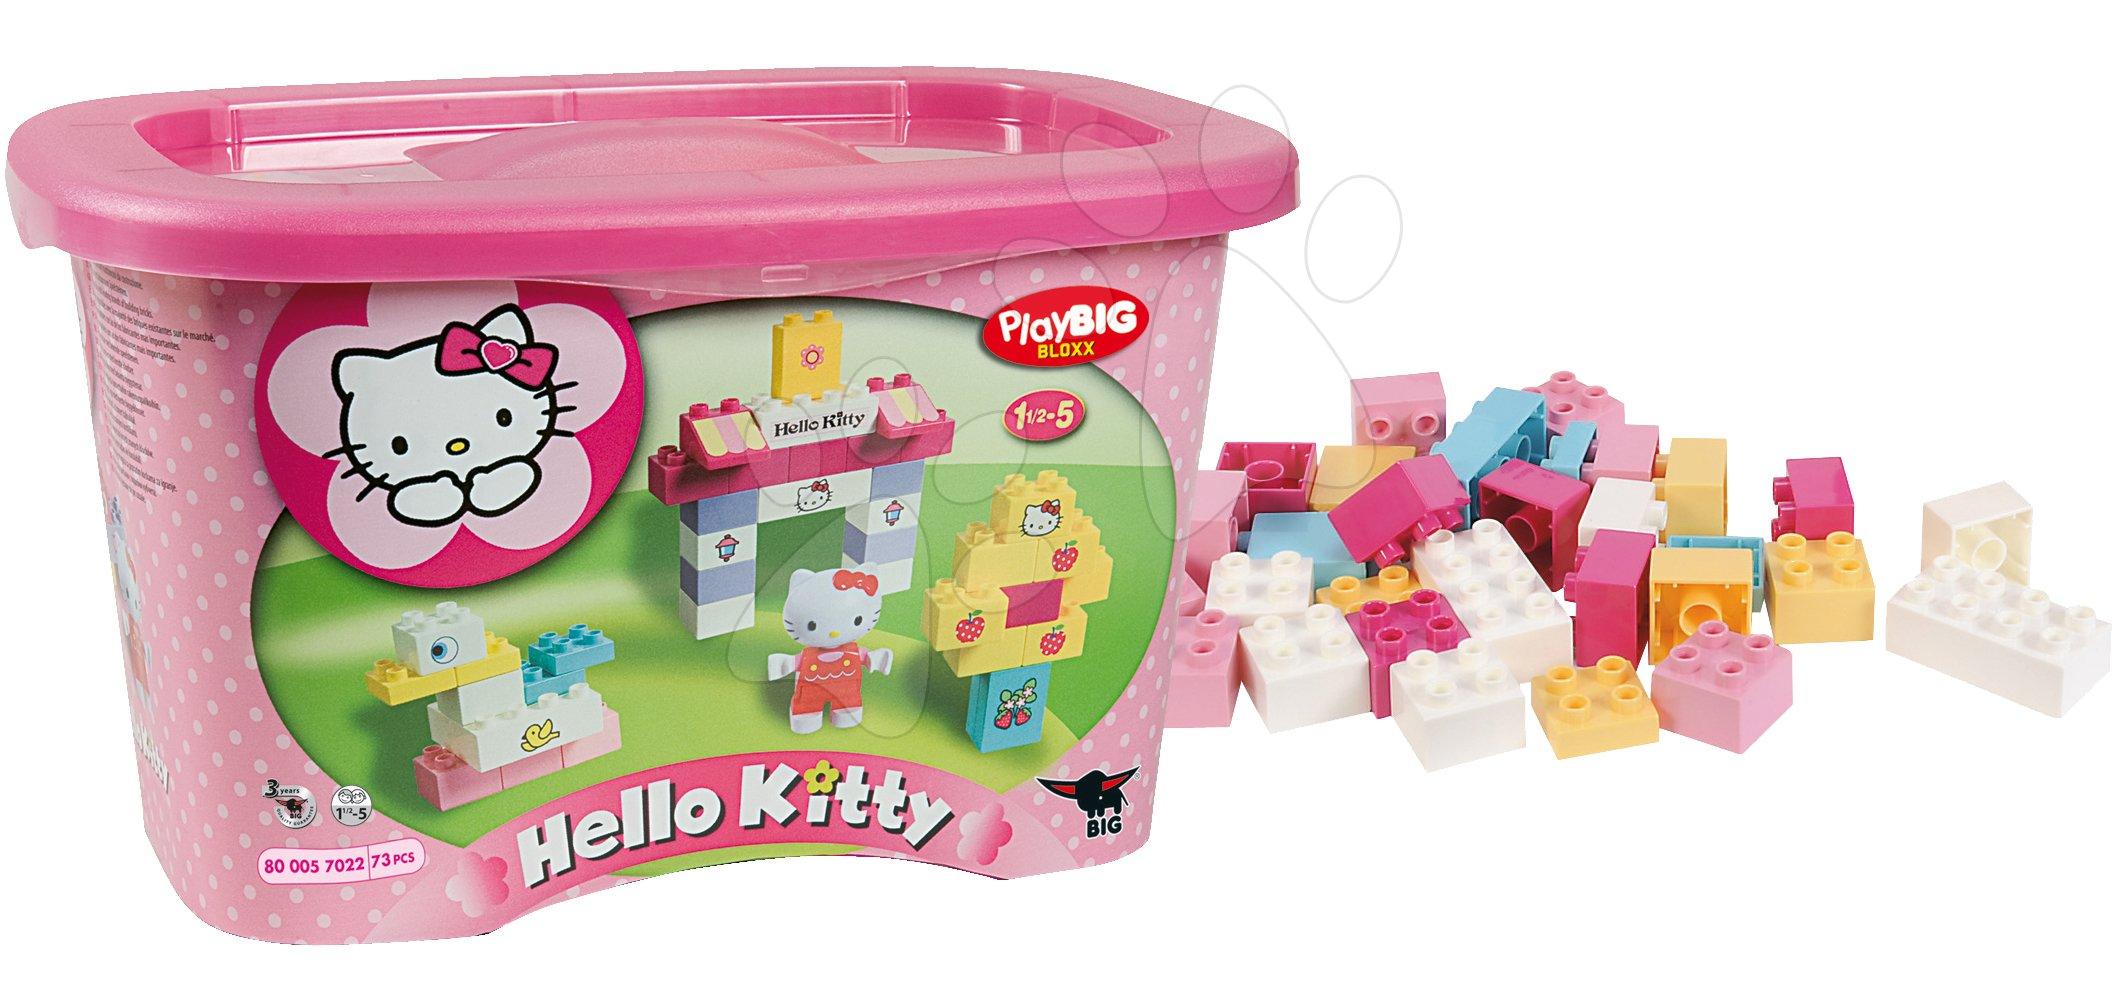 Stavebnice BIG-Bloxx ako lego - Stavebnica v dóze PlayBIG BIG Hello Kitty 73 kusov od 18 mes